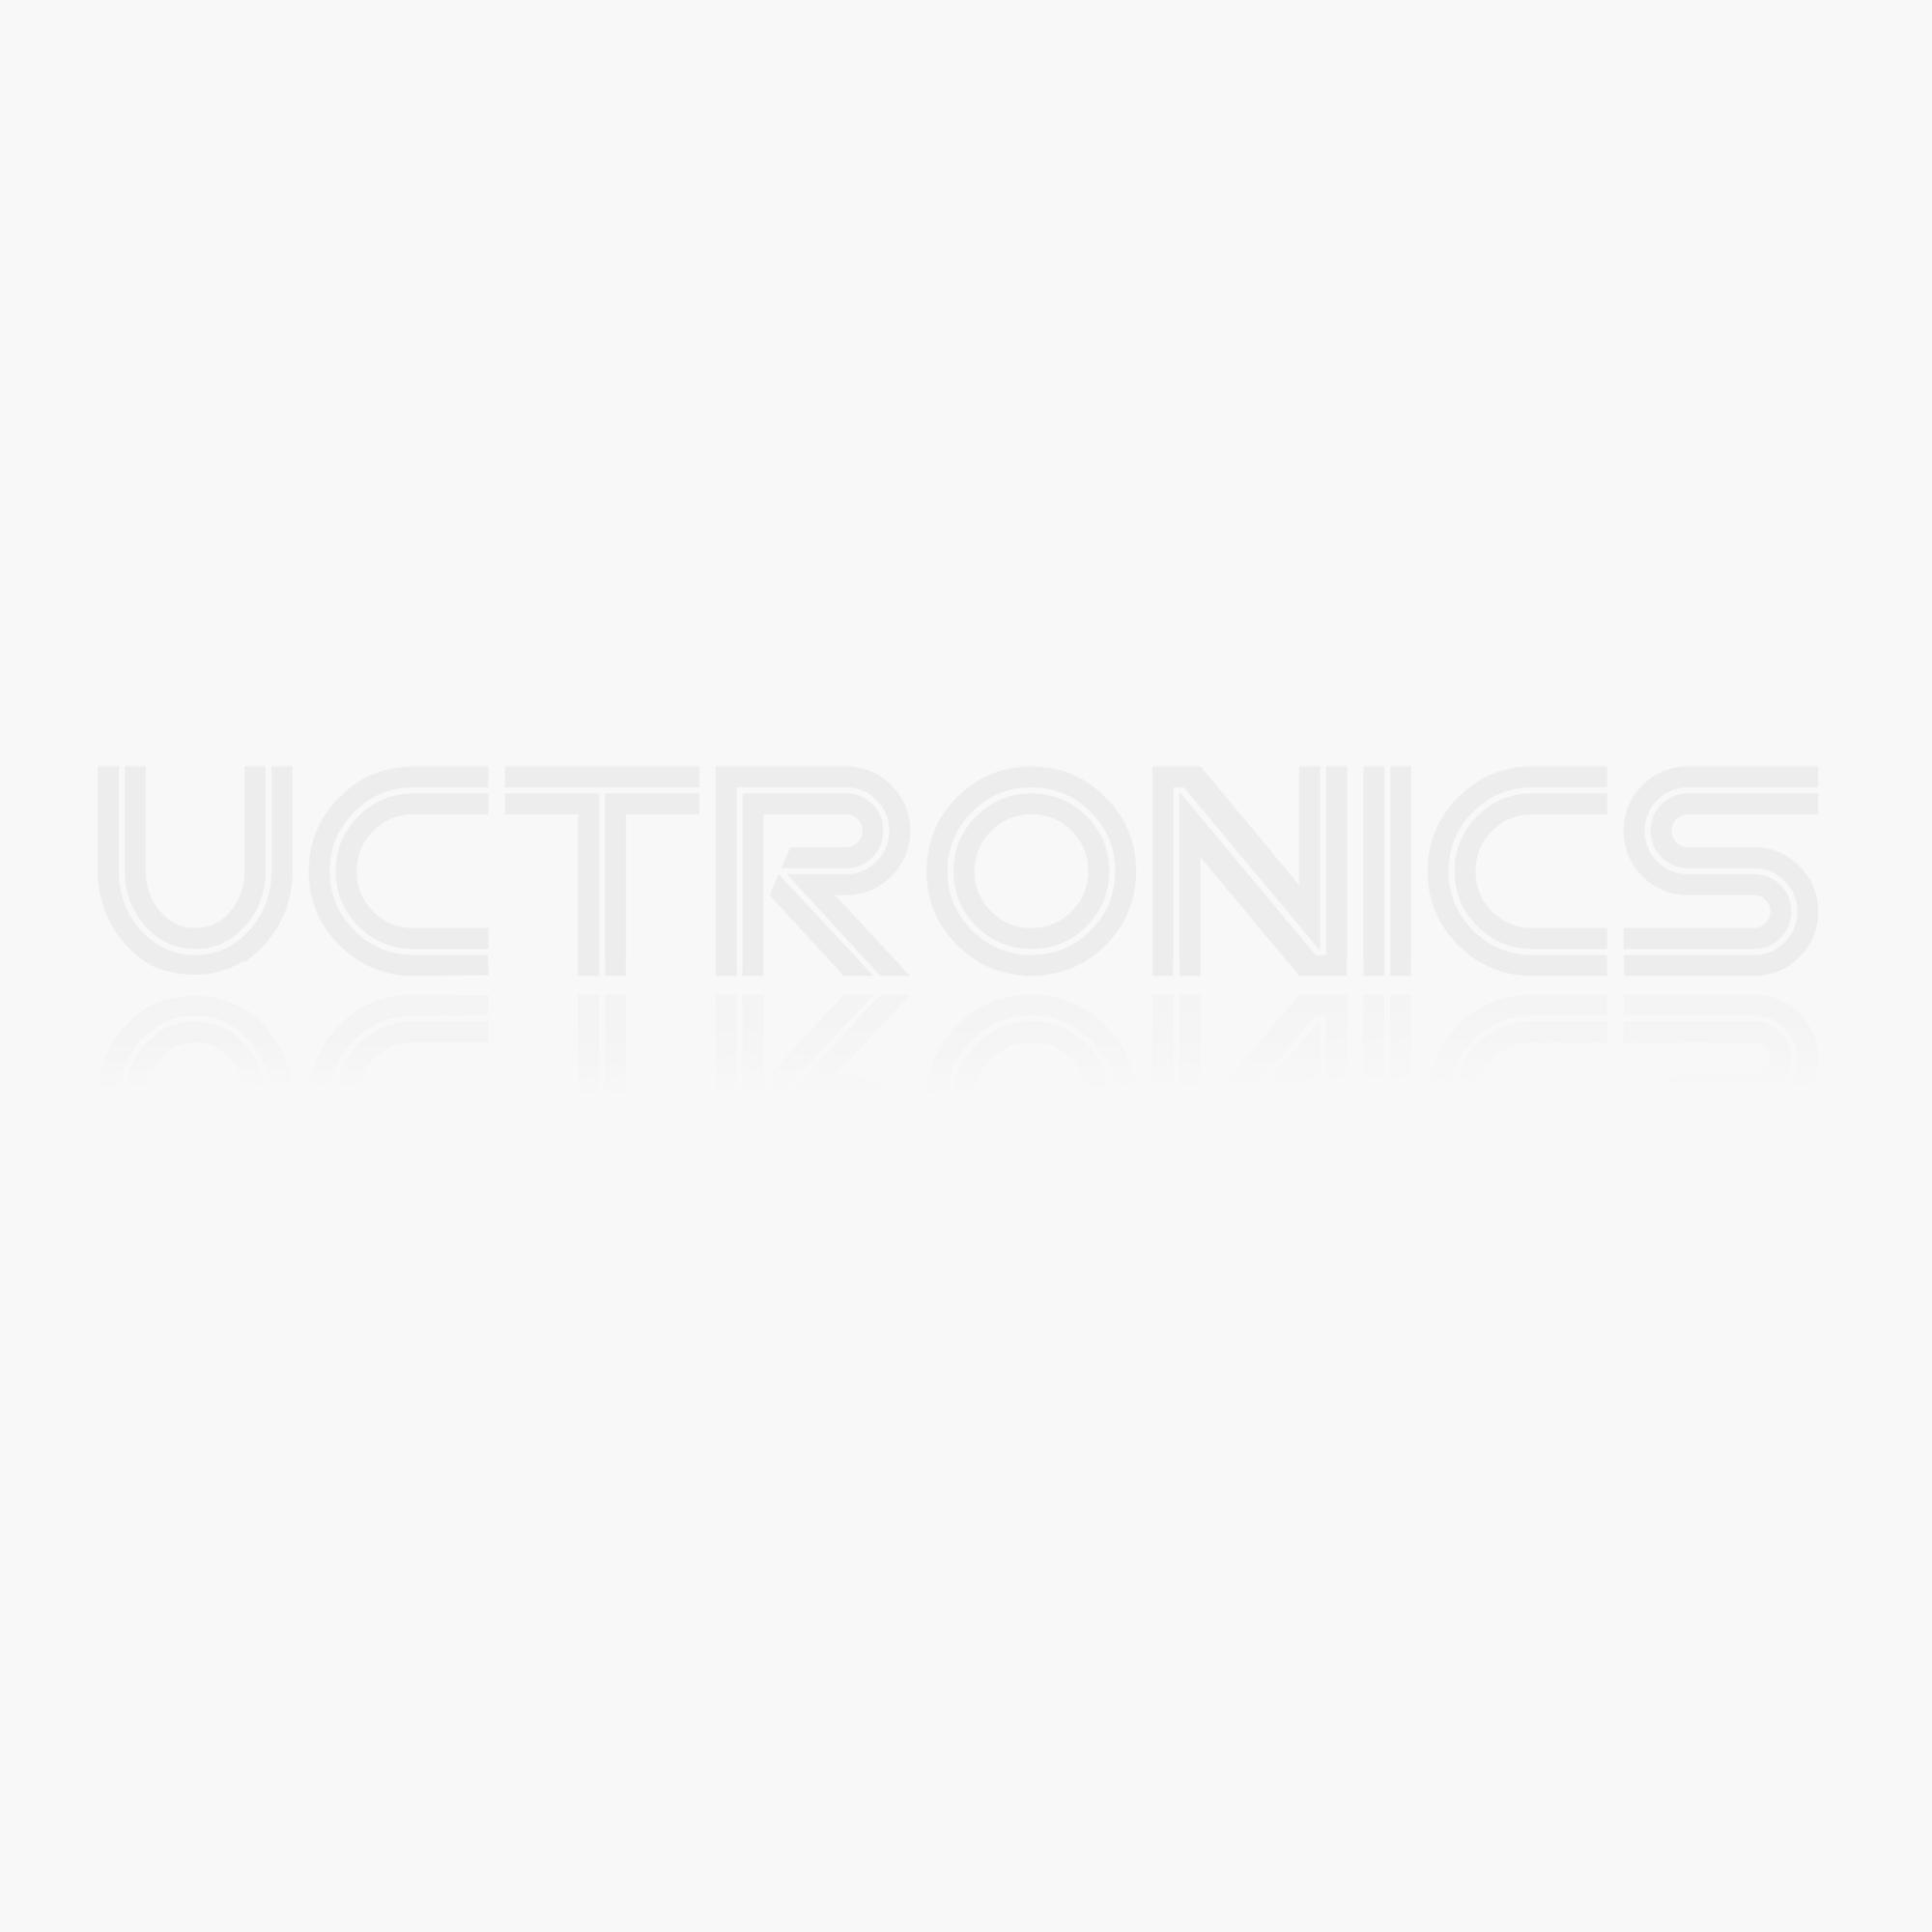 220V 2000W SCR Voltage Regulator Dimmer Speed Controller Thermostat Module